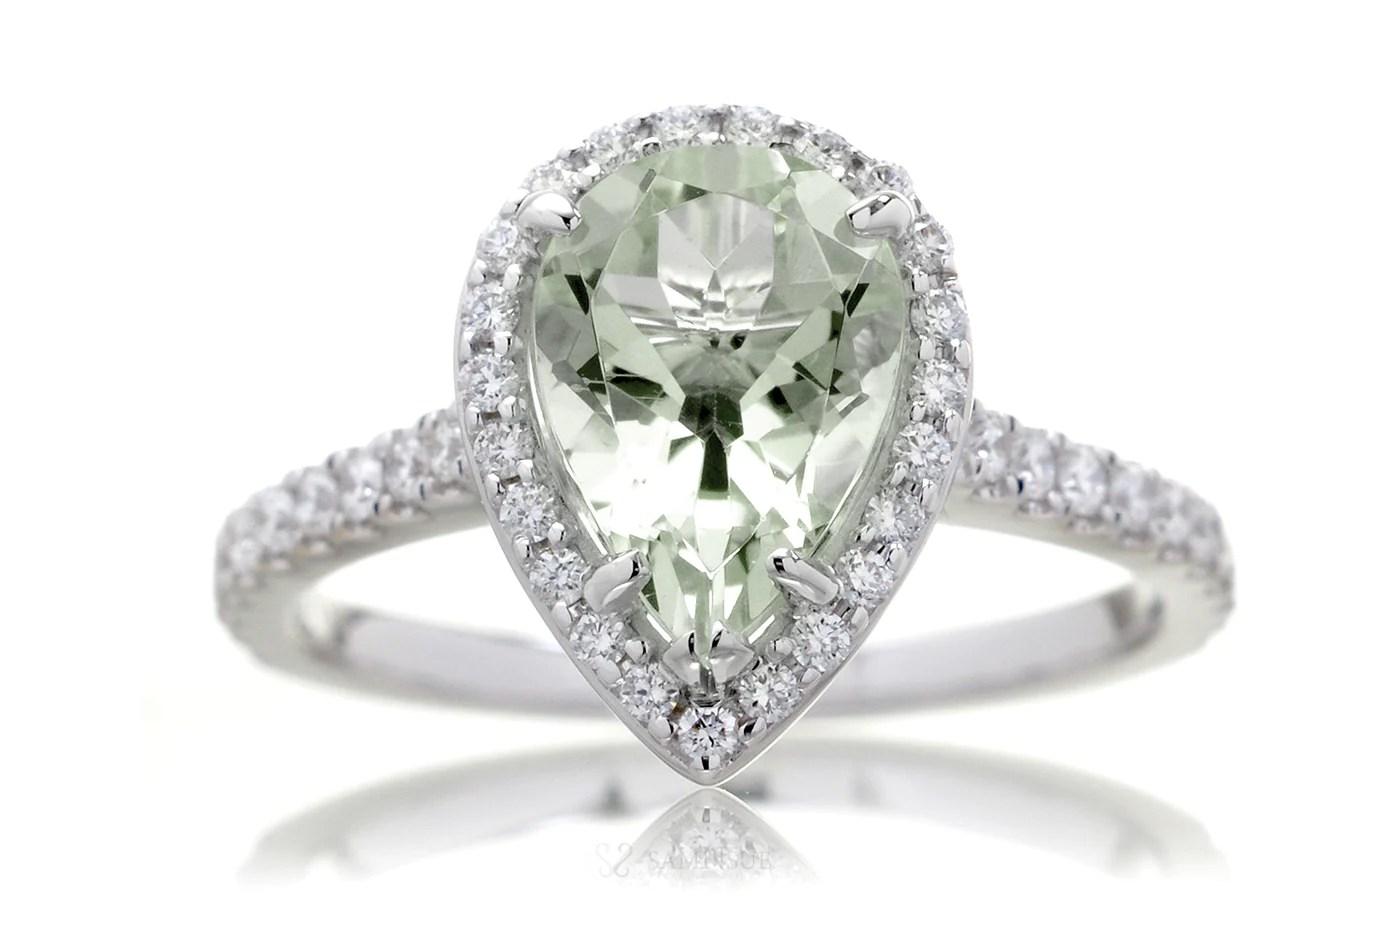 Green Quartz Prasiolite Engagement Ring Pear 10x7 Cut